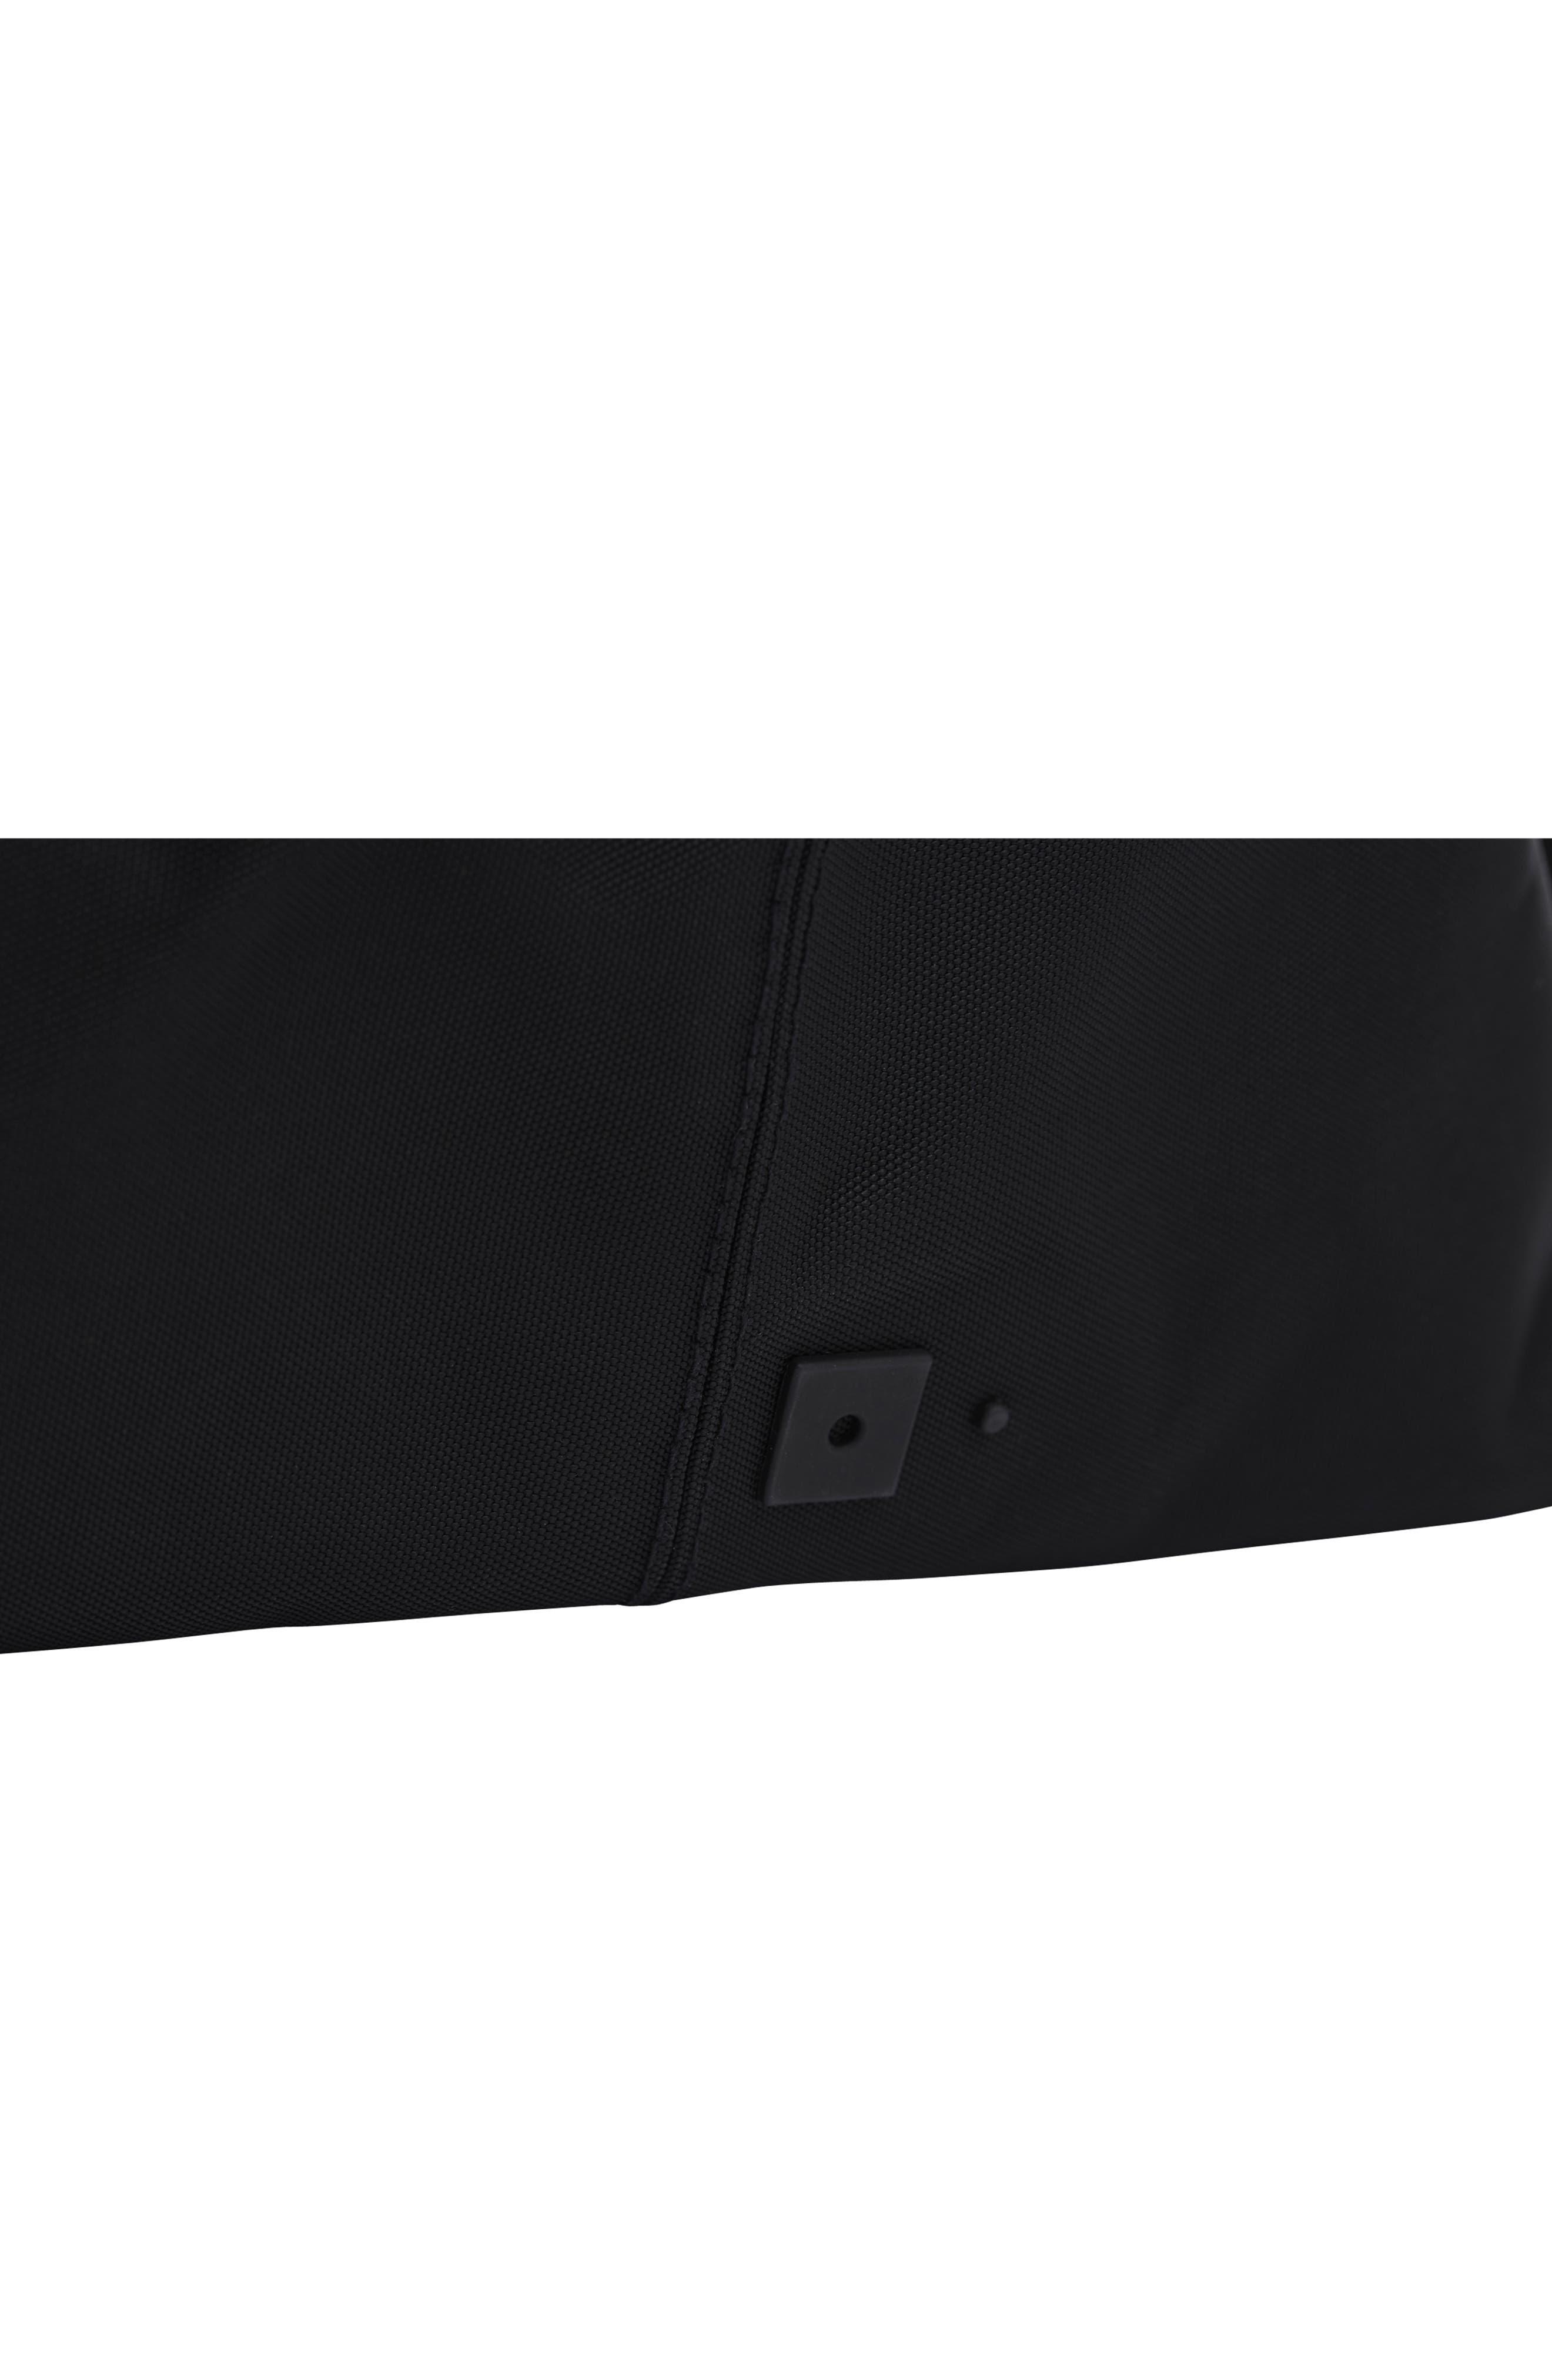 Lightweight Duffel Bag,                             Alternate thumbnail 8, color,                             Black Nylon/ Black Leather